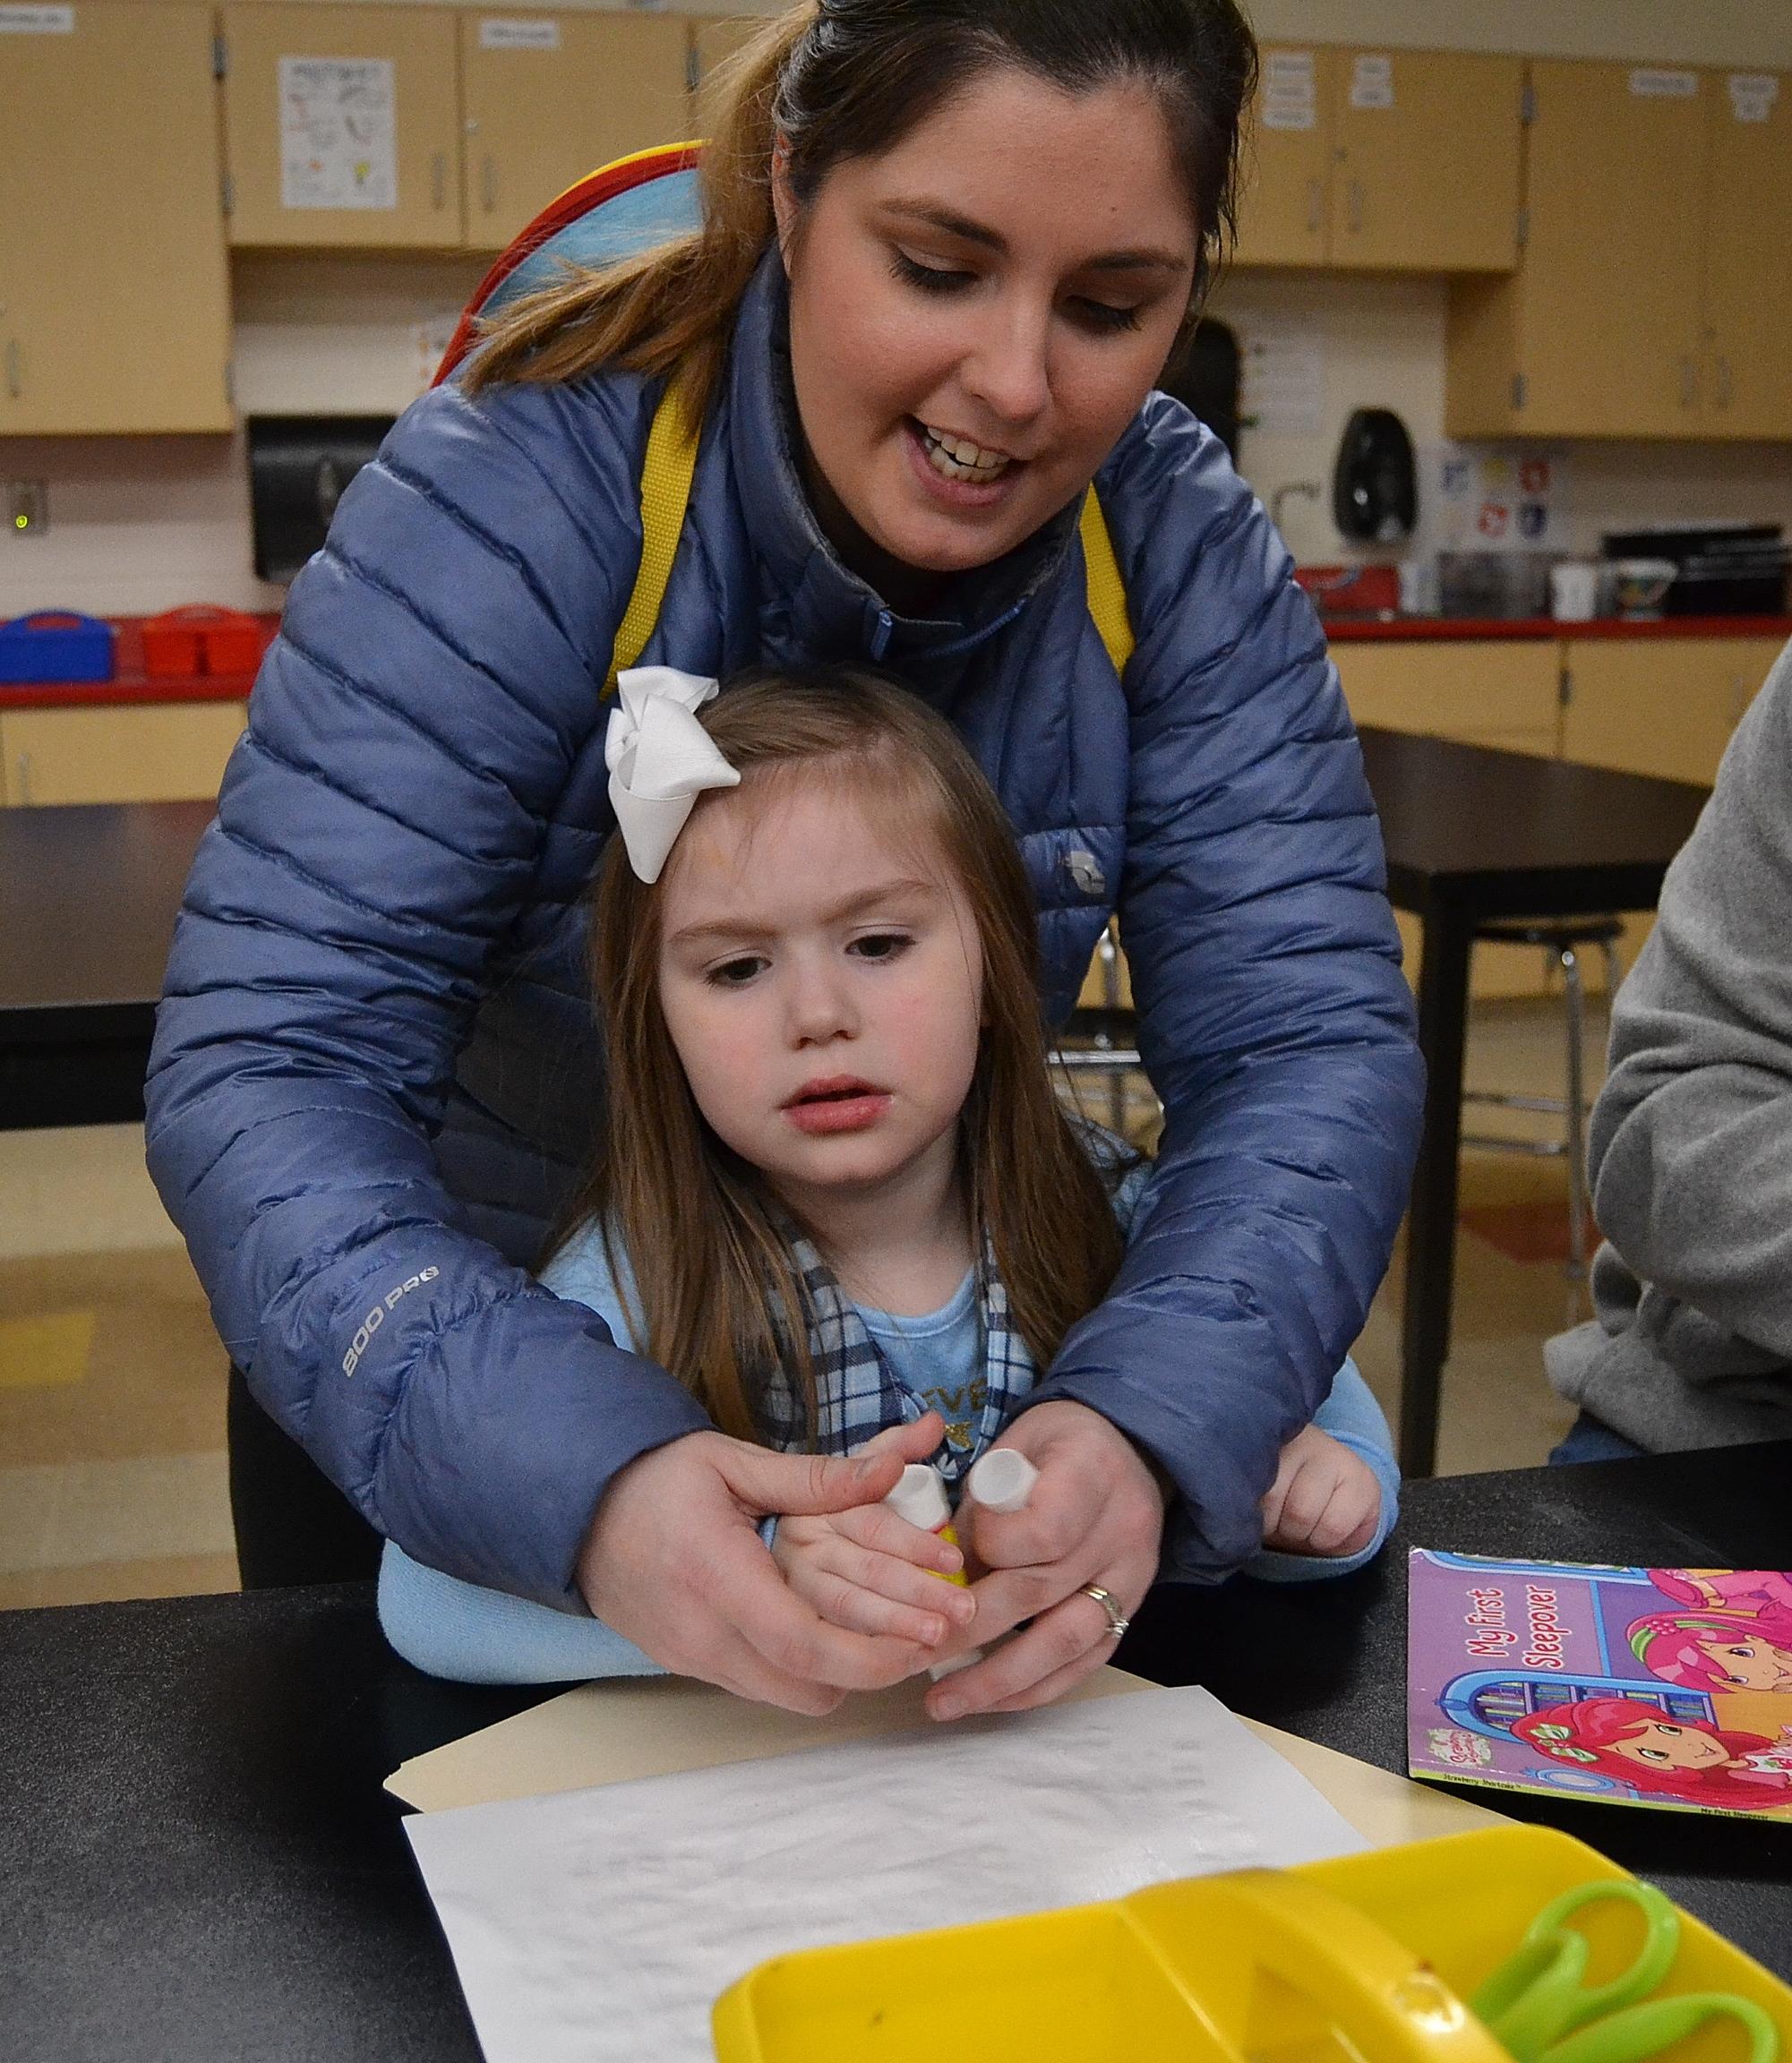 parent helping child